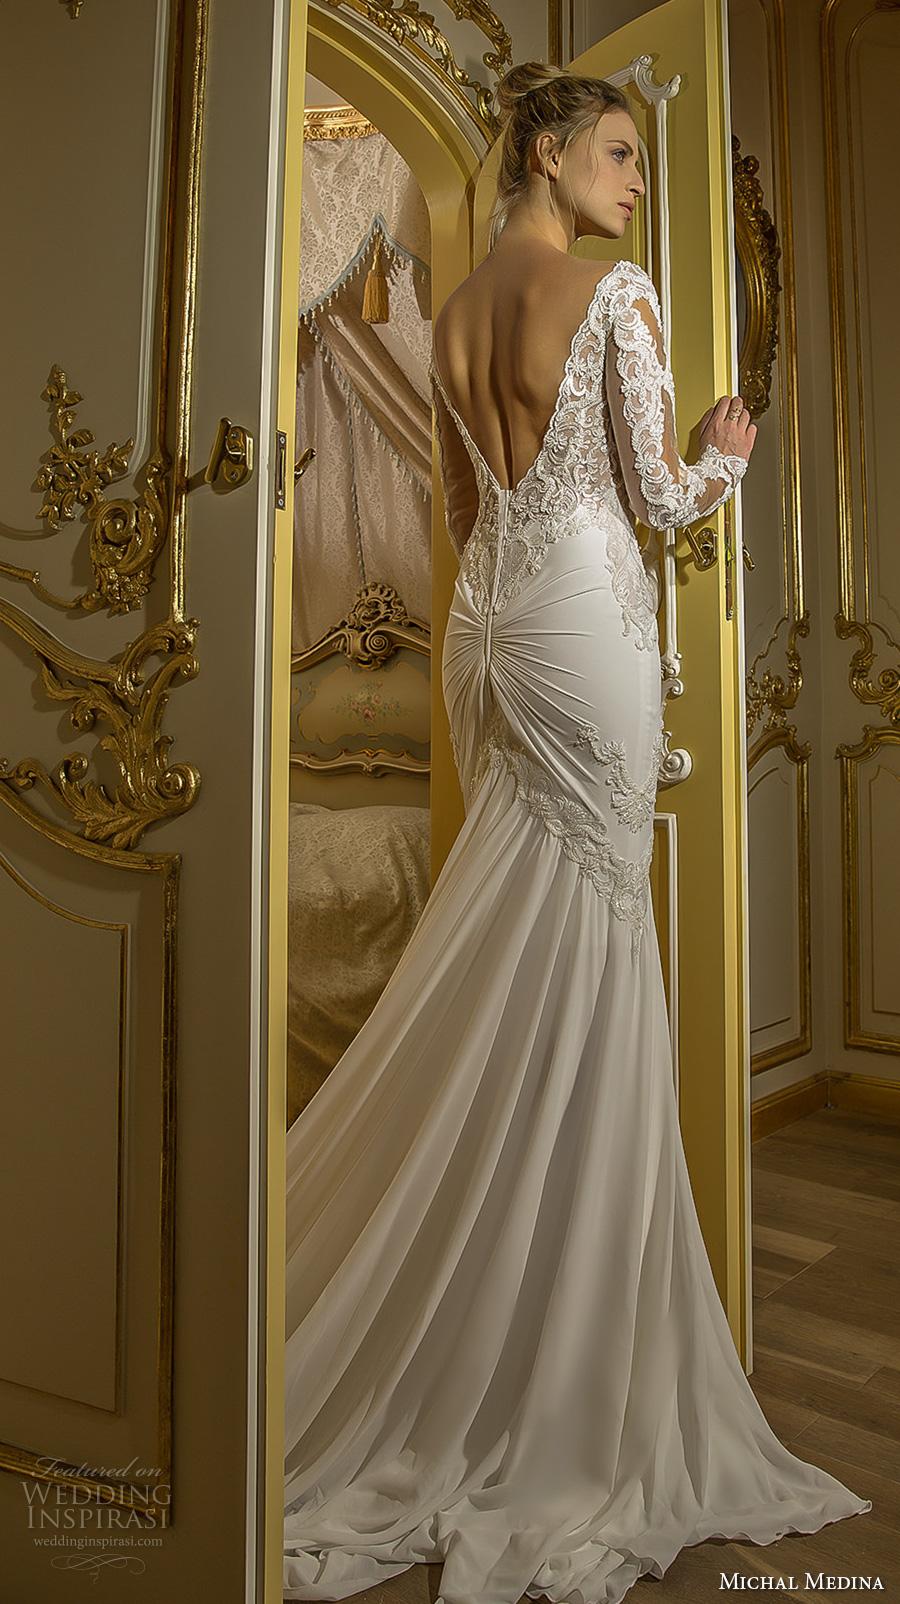 michal medina 2017 bridal long sleeves illusion beateau sweetheart neckline heavily embellished bodice elegant sheath fit flare wedding dress open low back chapel train (emma) bv